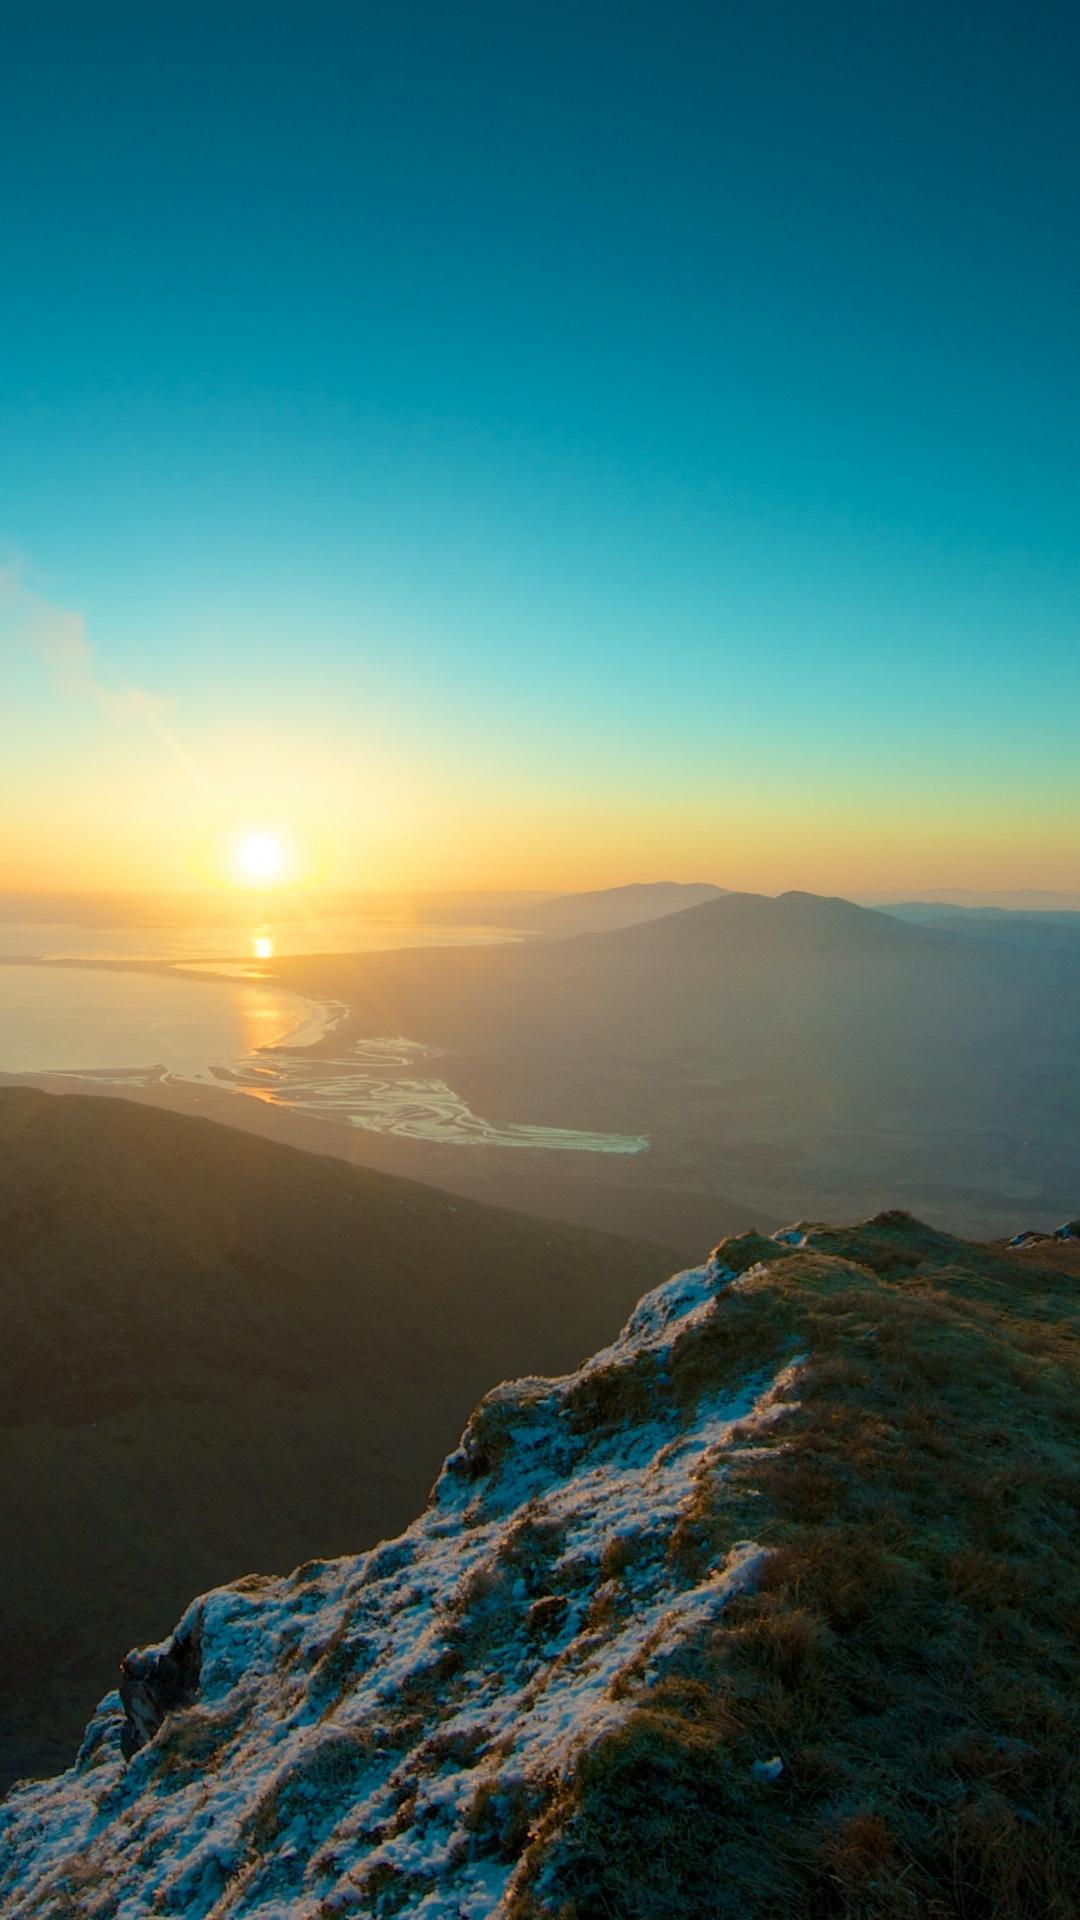 Wallpaper iPhone retina Parallax mountains sky sunset peaks Mountain : Sky Sunset